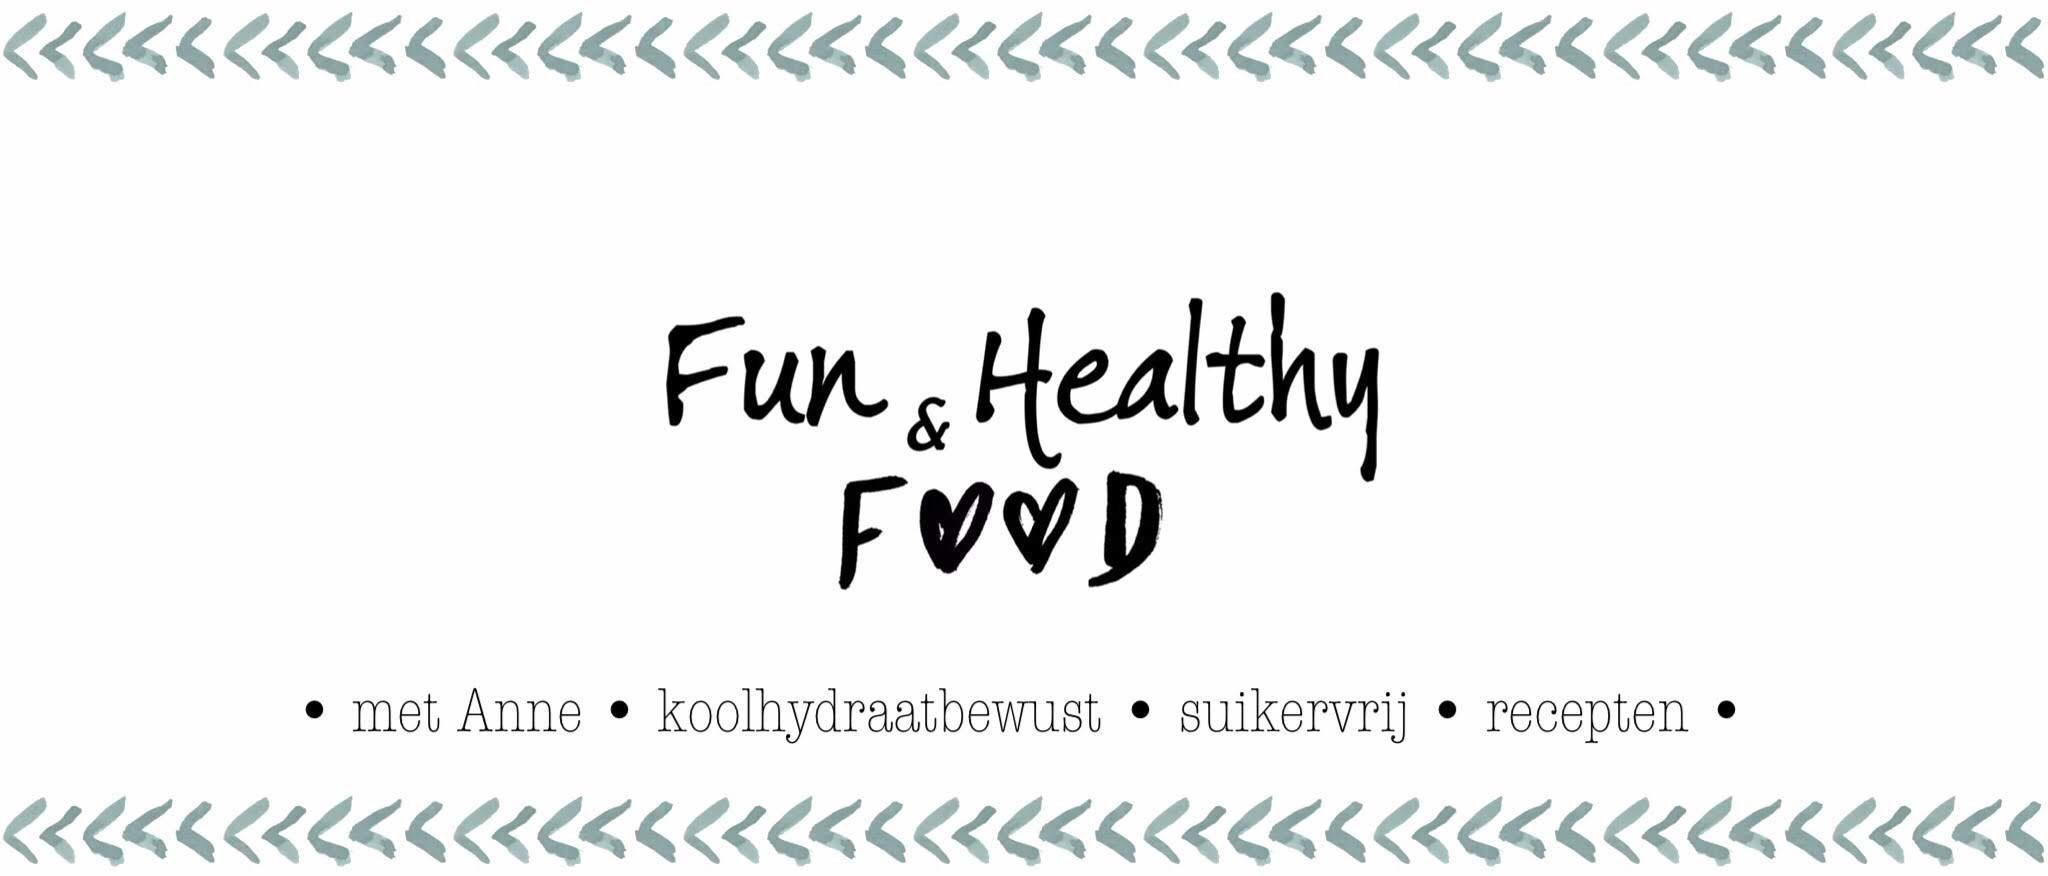 Fun and healthy food